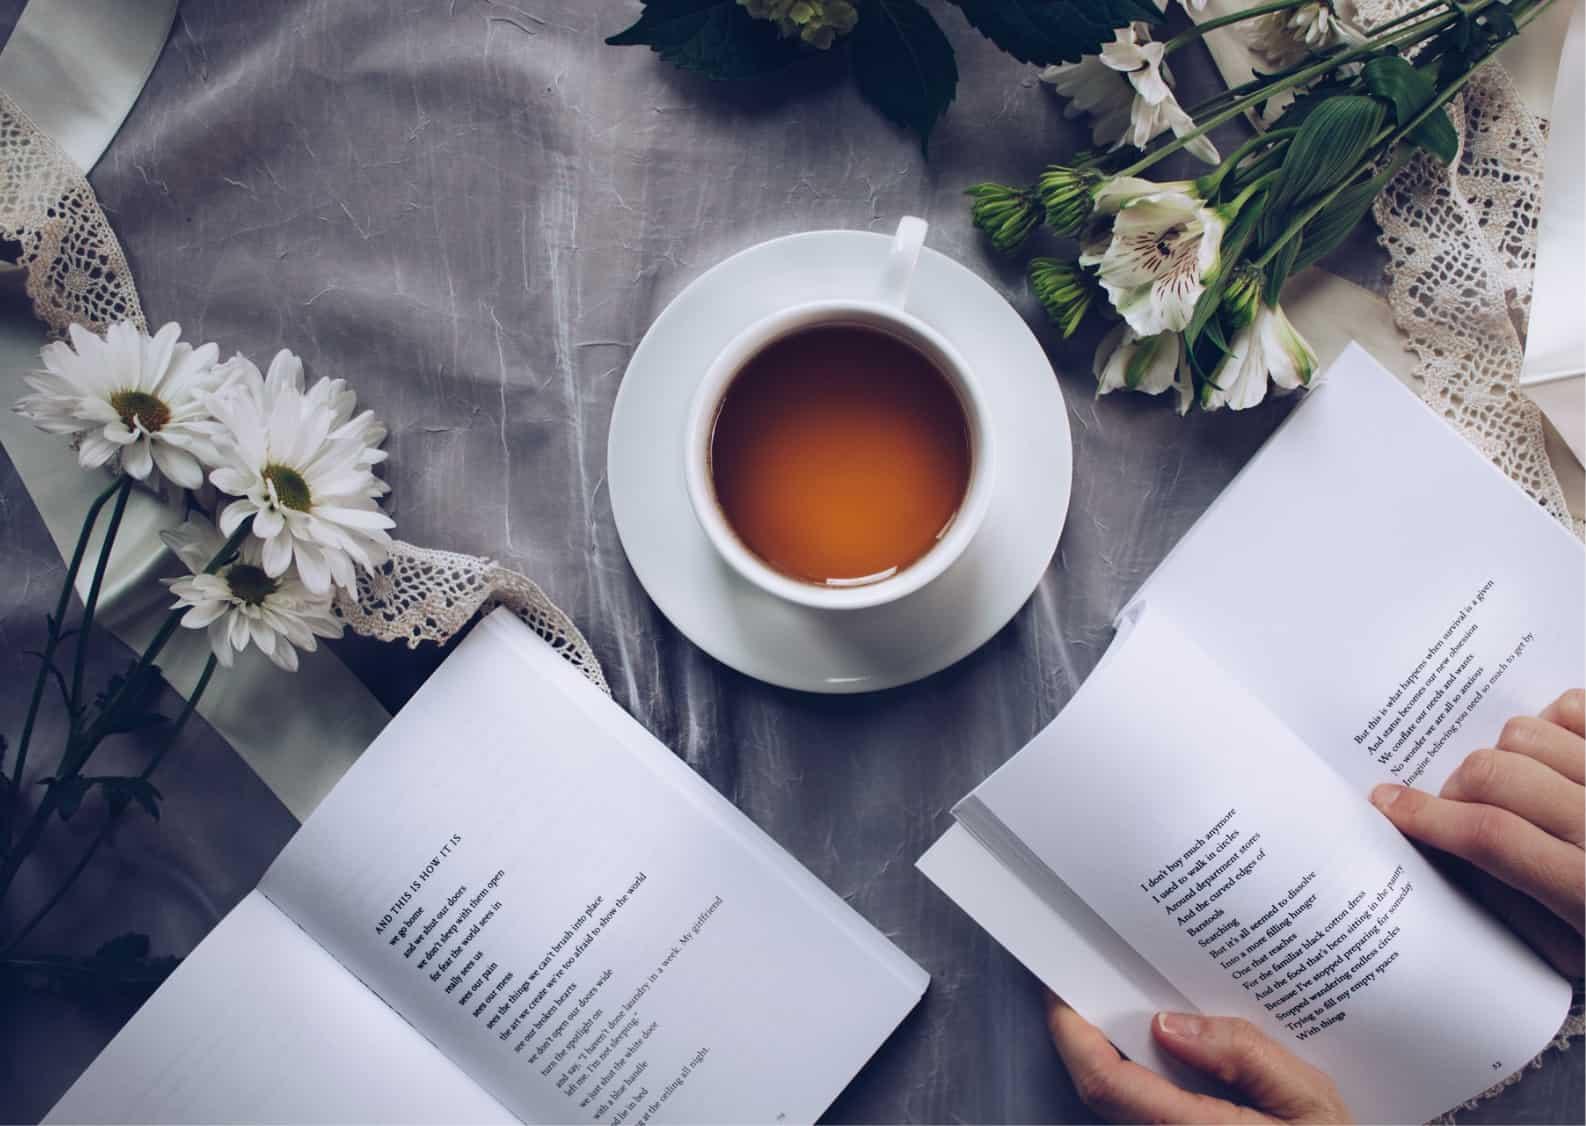 beverage-books-caffeine-904616